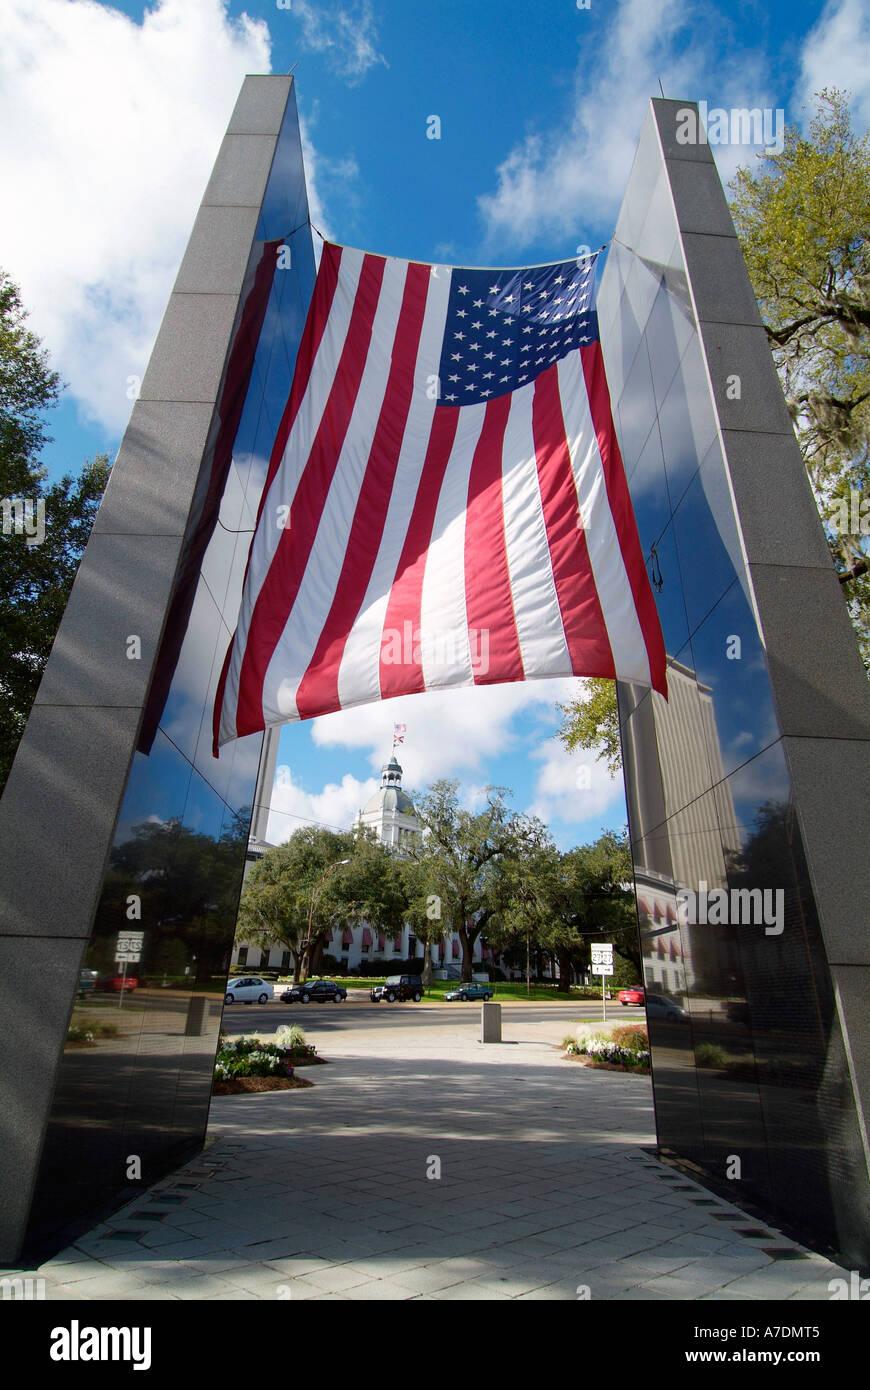 Viet Nam War Memorial Tallahassee Florida - Stock Image